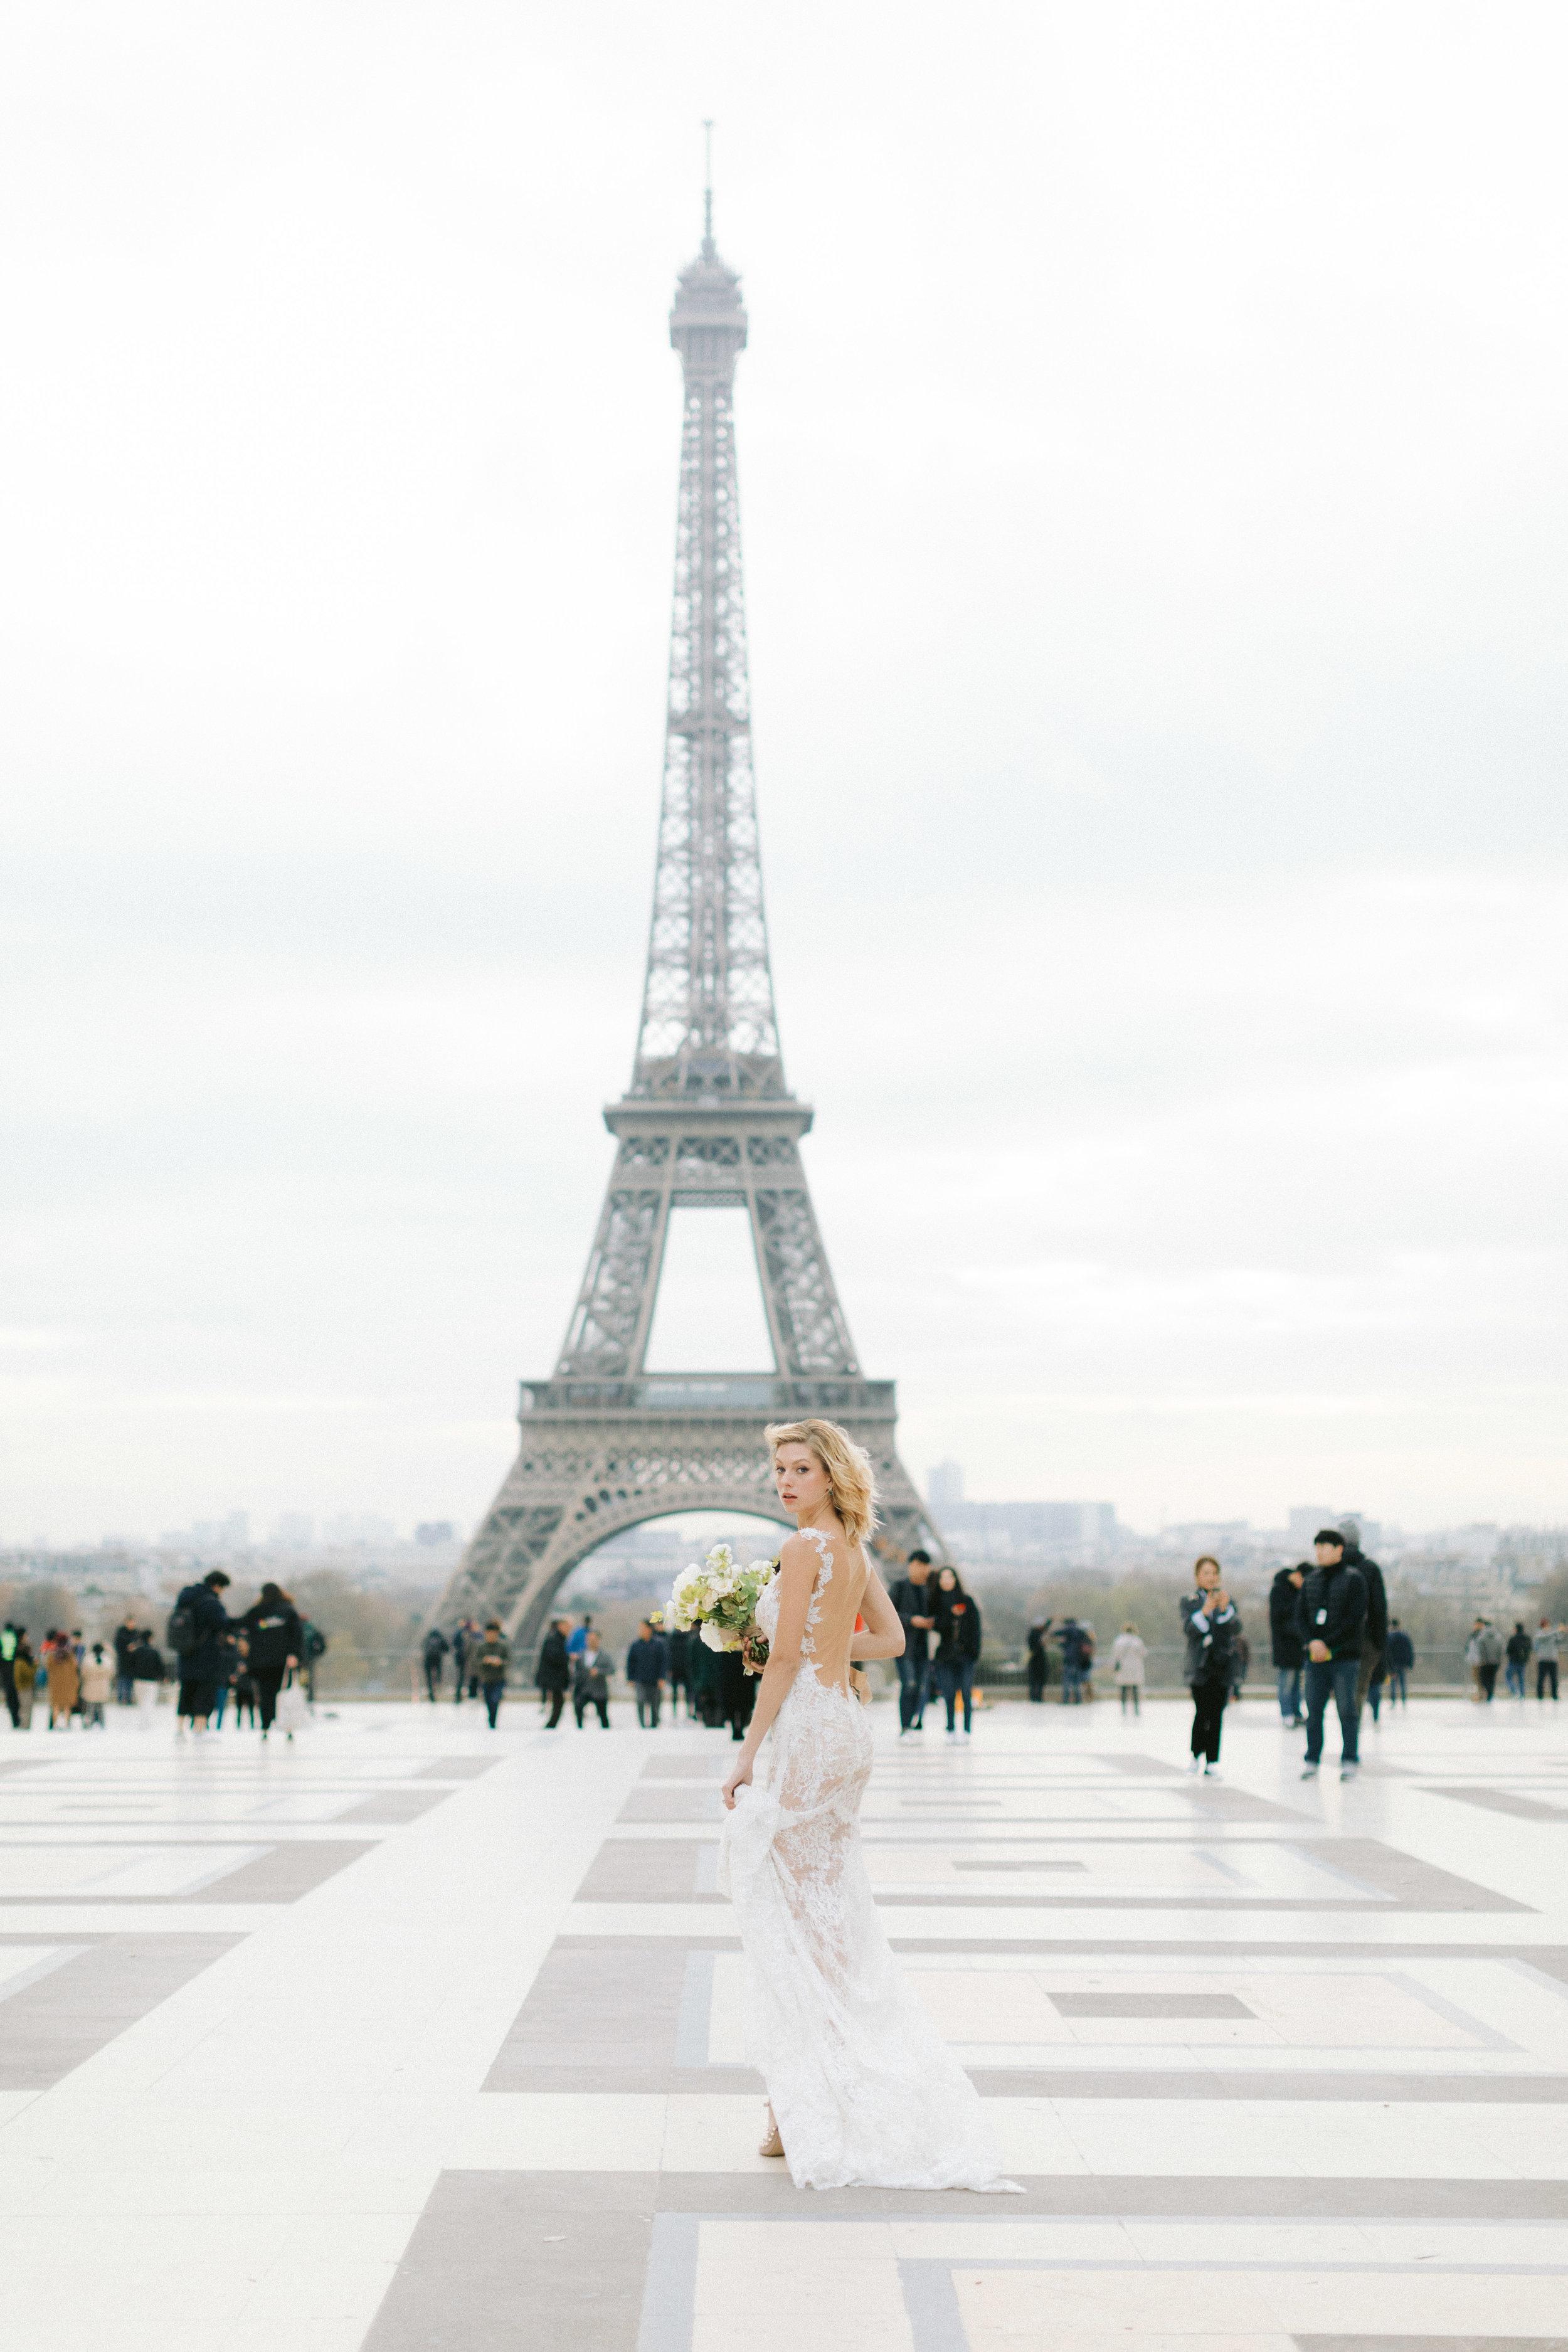 JennyQuicksallPhotography_www.jennyquicksall.com_ParisFranceEditorial_-124.jpg